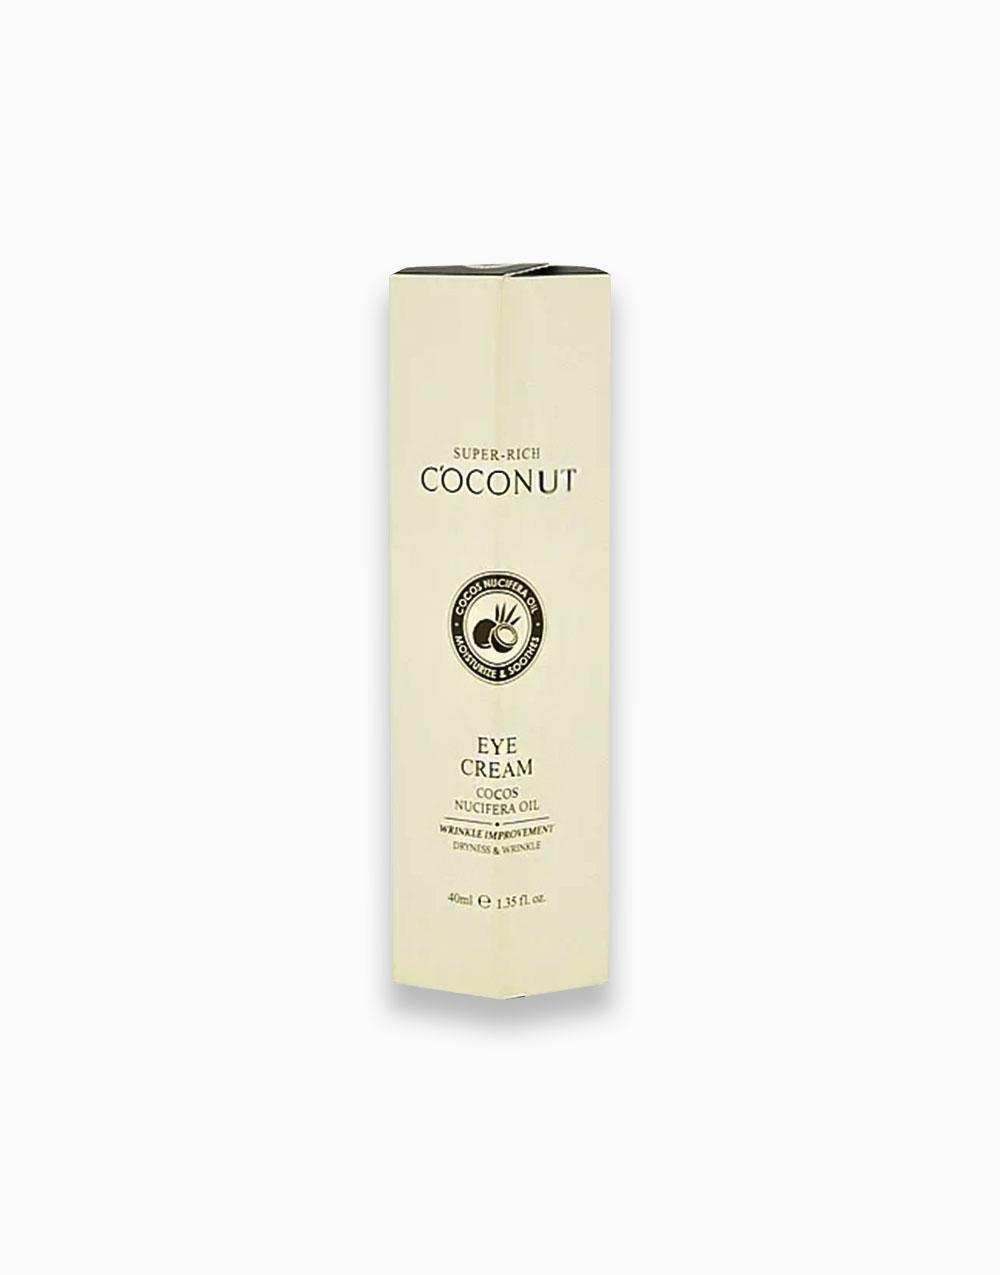 Super Rich Coconut Eye Cream by Esfolio